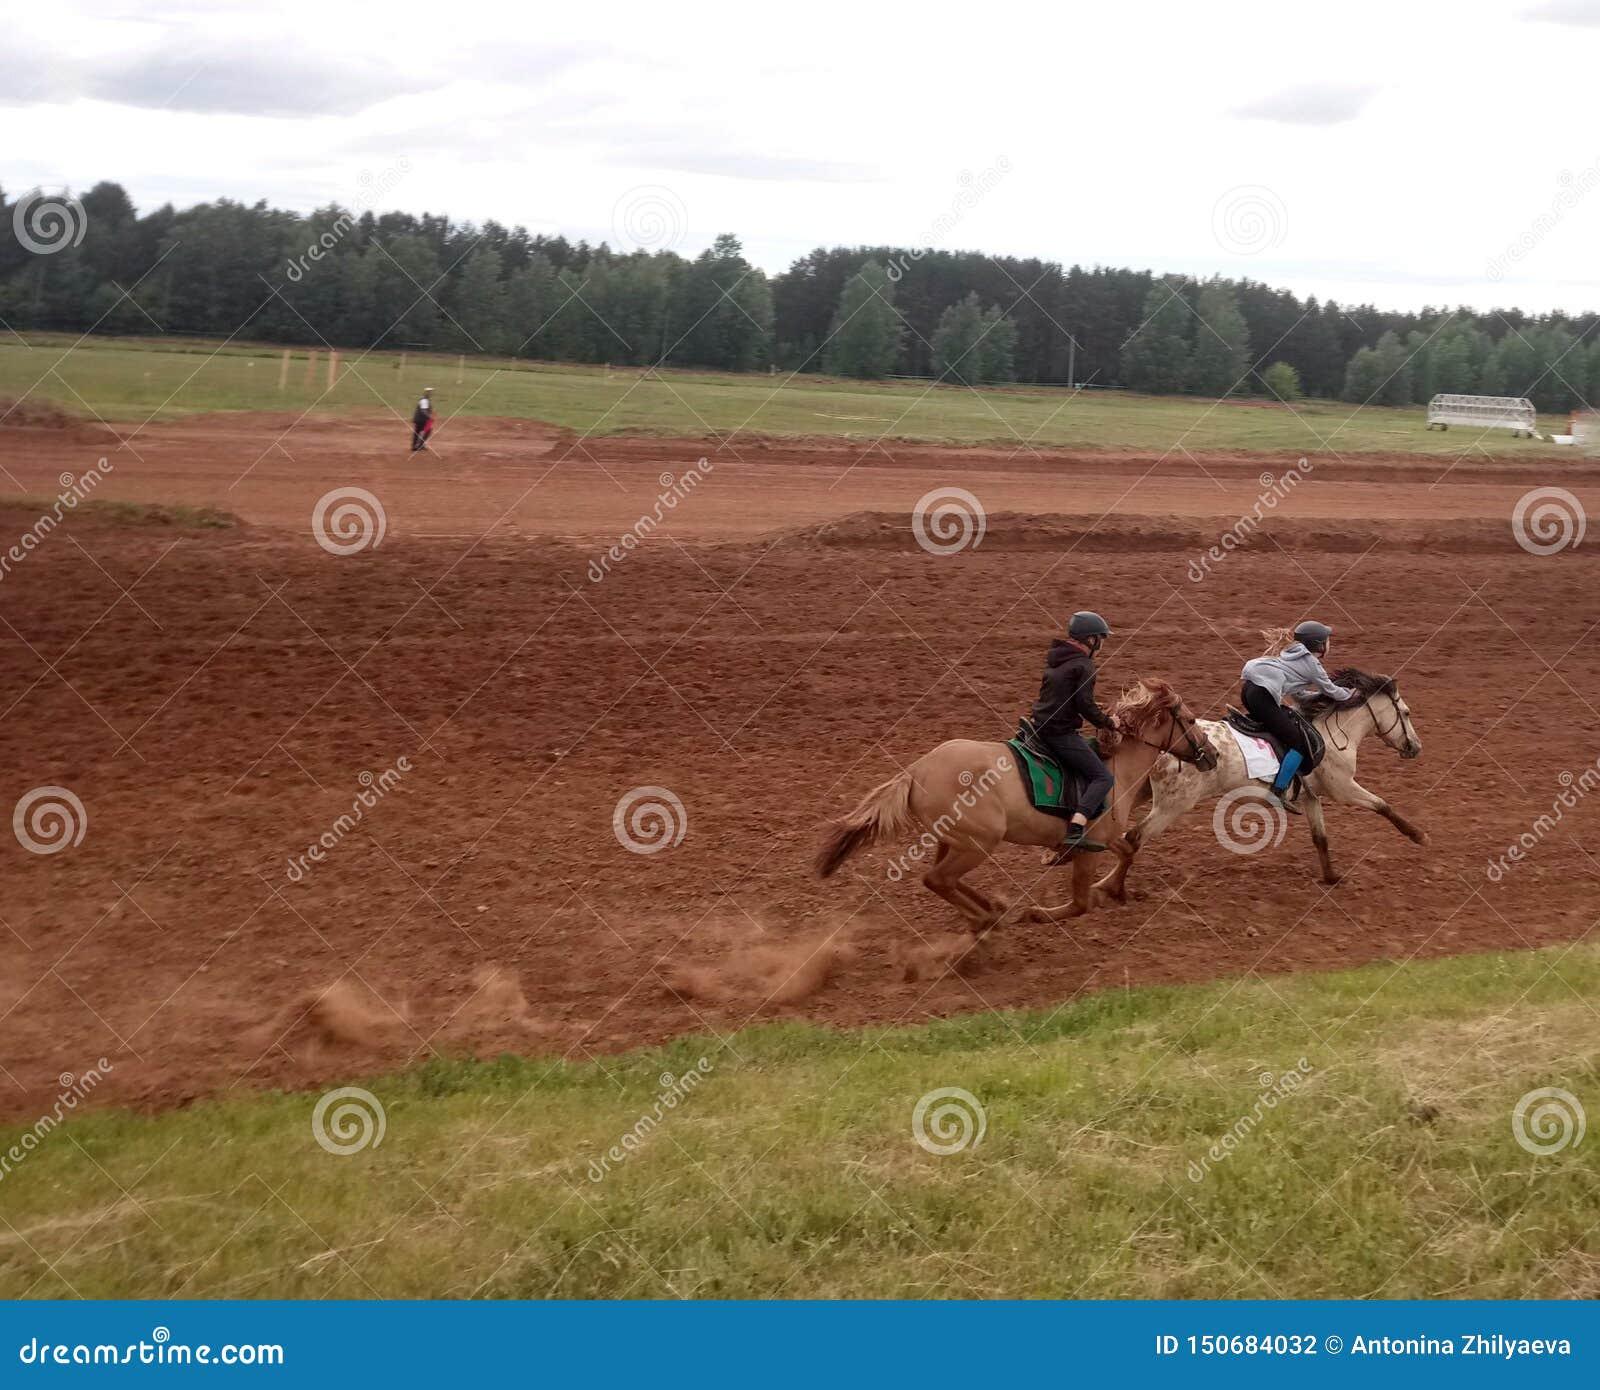 Correndo due cavalieri a cavallo